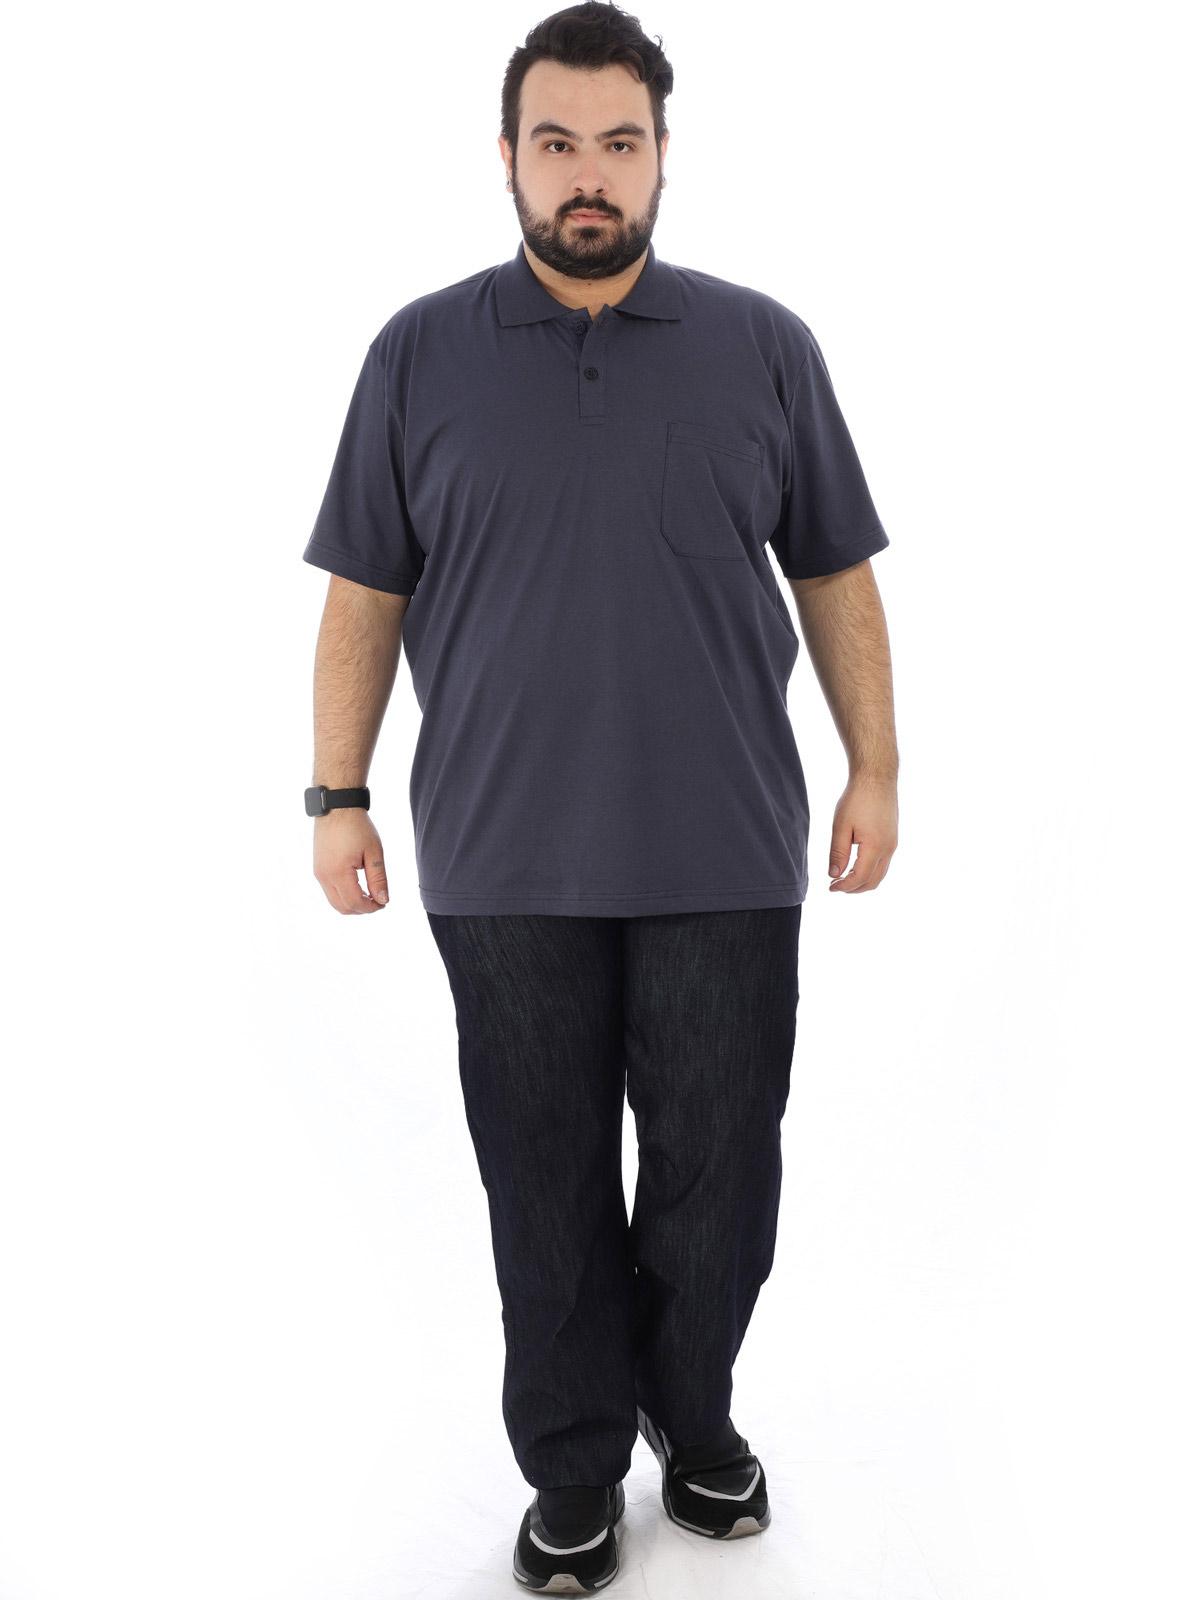 Camisa Polo Plus Size Masculina com Bolso Basica Grafite